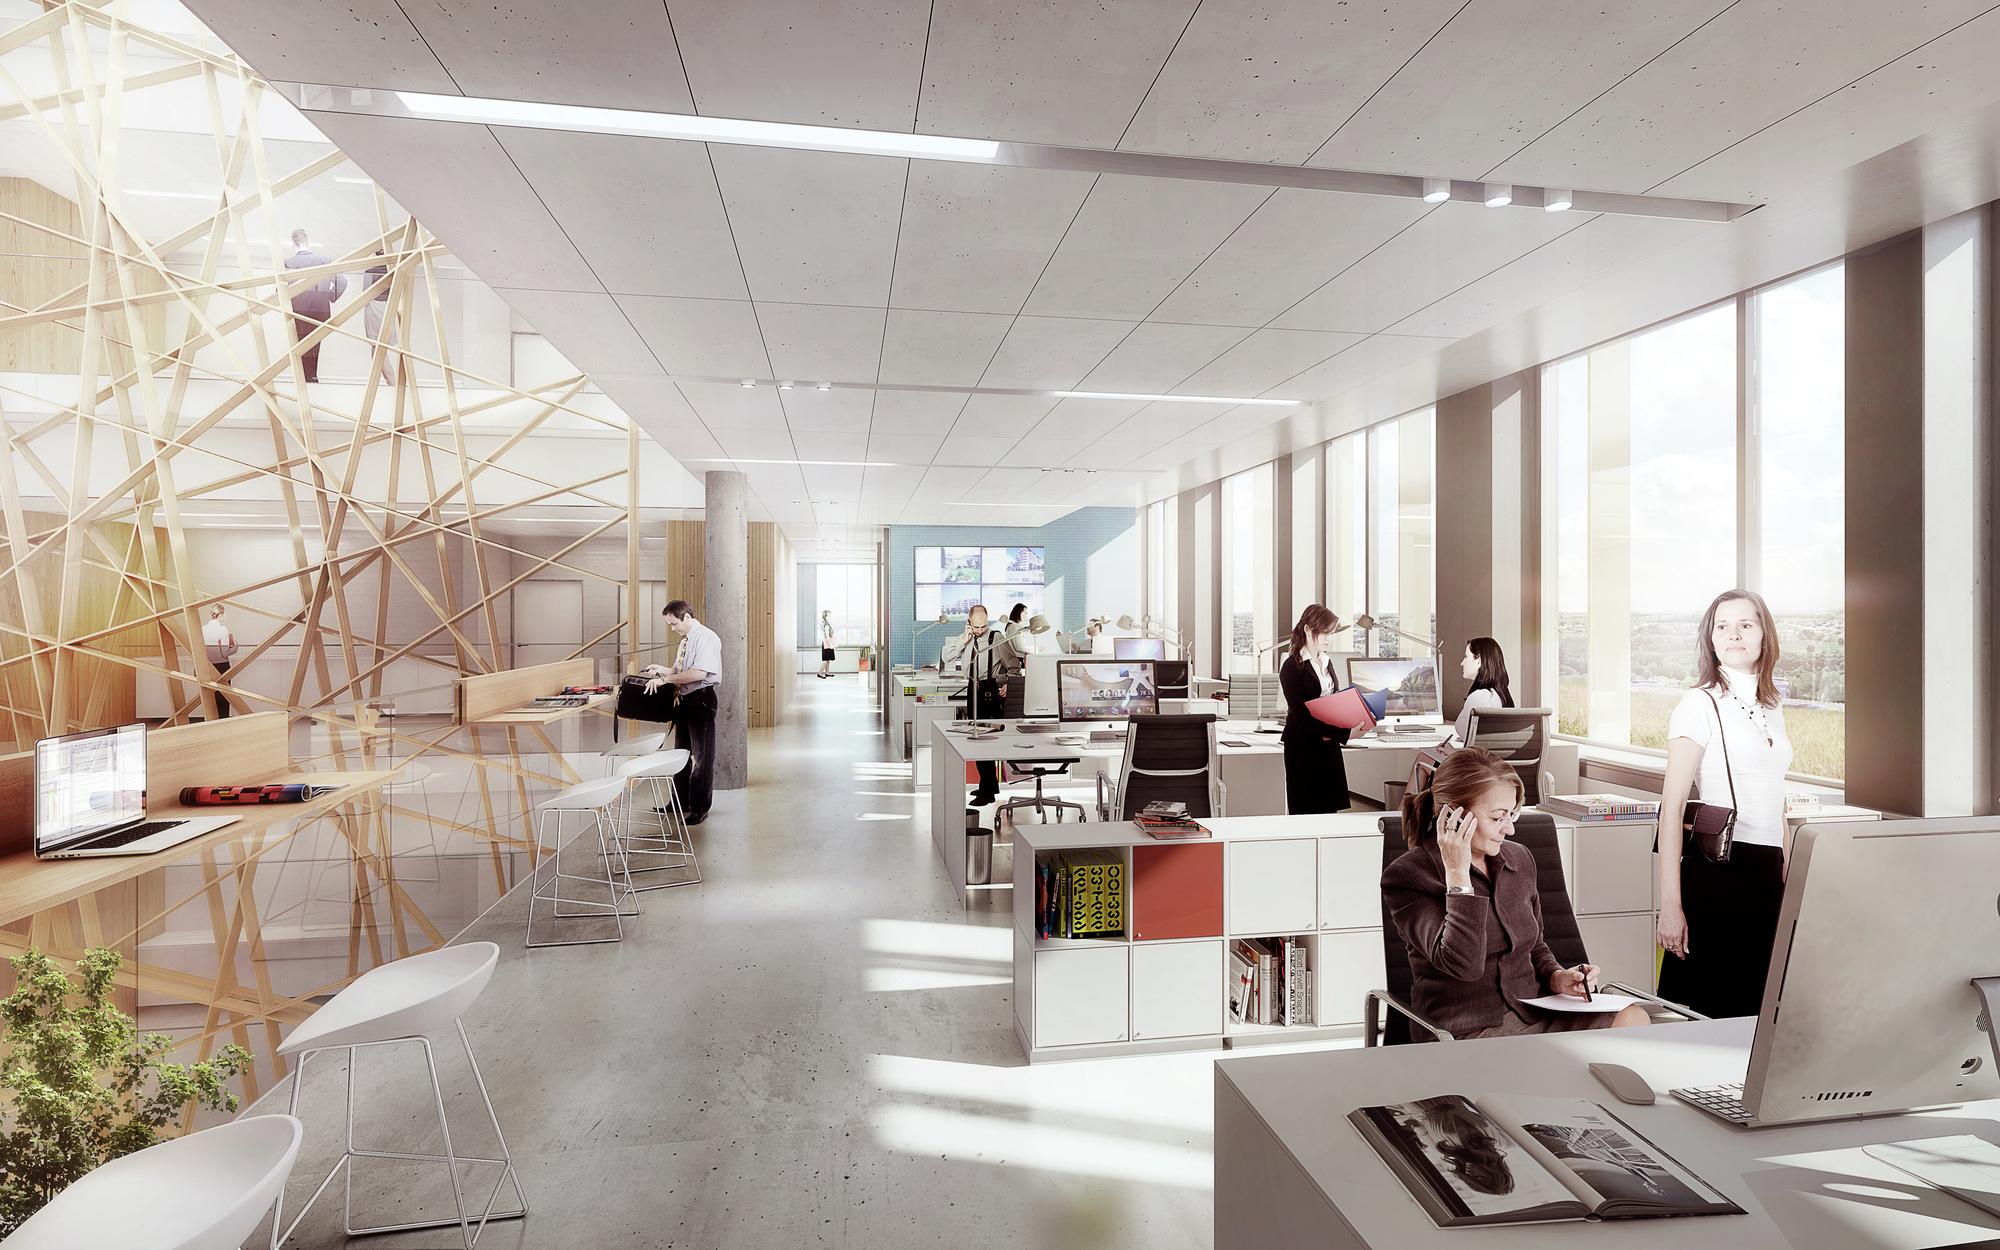 Gallery Of Arkitema Designs Municipal Office Building For Aarhus 8